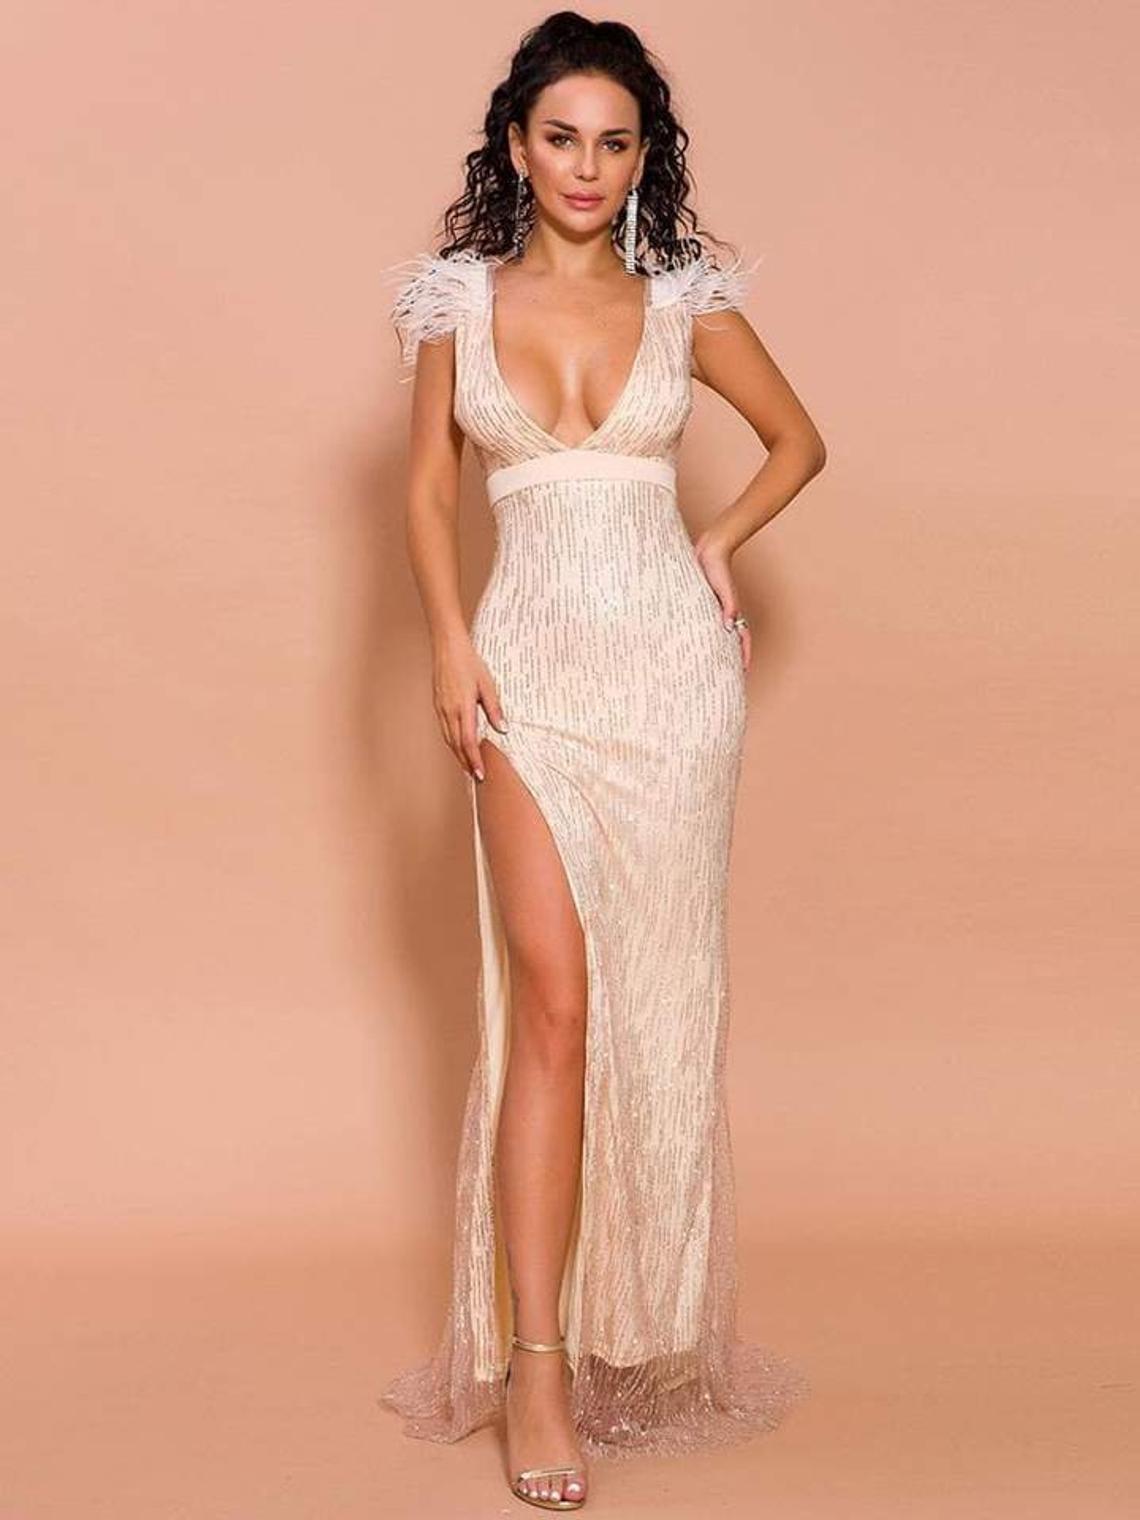 Shoulder Feather Long Dress Plunge Split Leg, Prom Dress, Wedding Dress, maxi dress, sparkle dress,